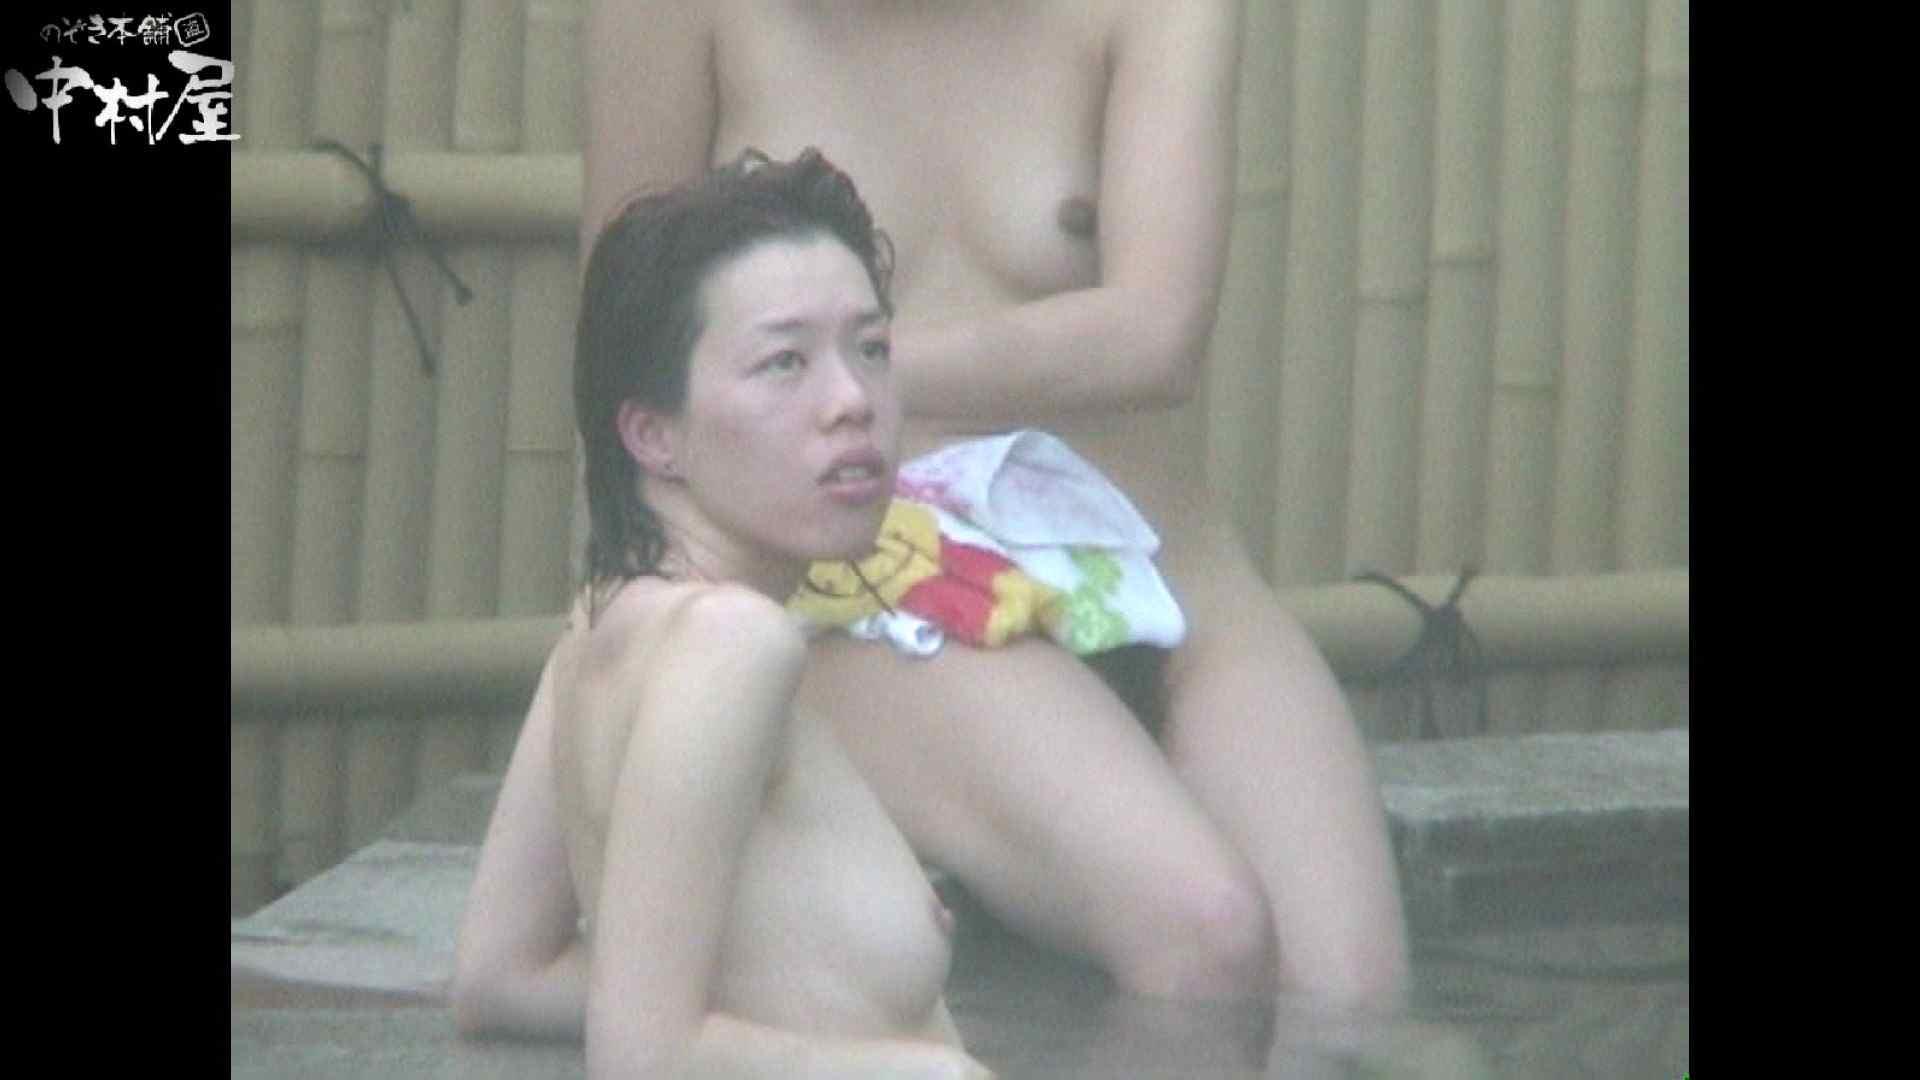 Aquaな露天風呂Vol.932 盗撮師作品   露天風呂突入  106pic 88